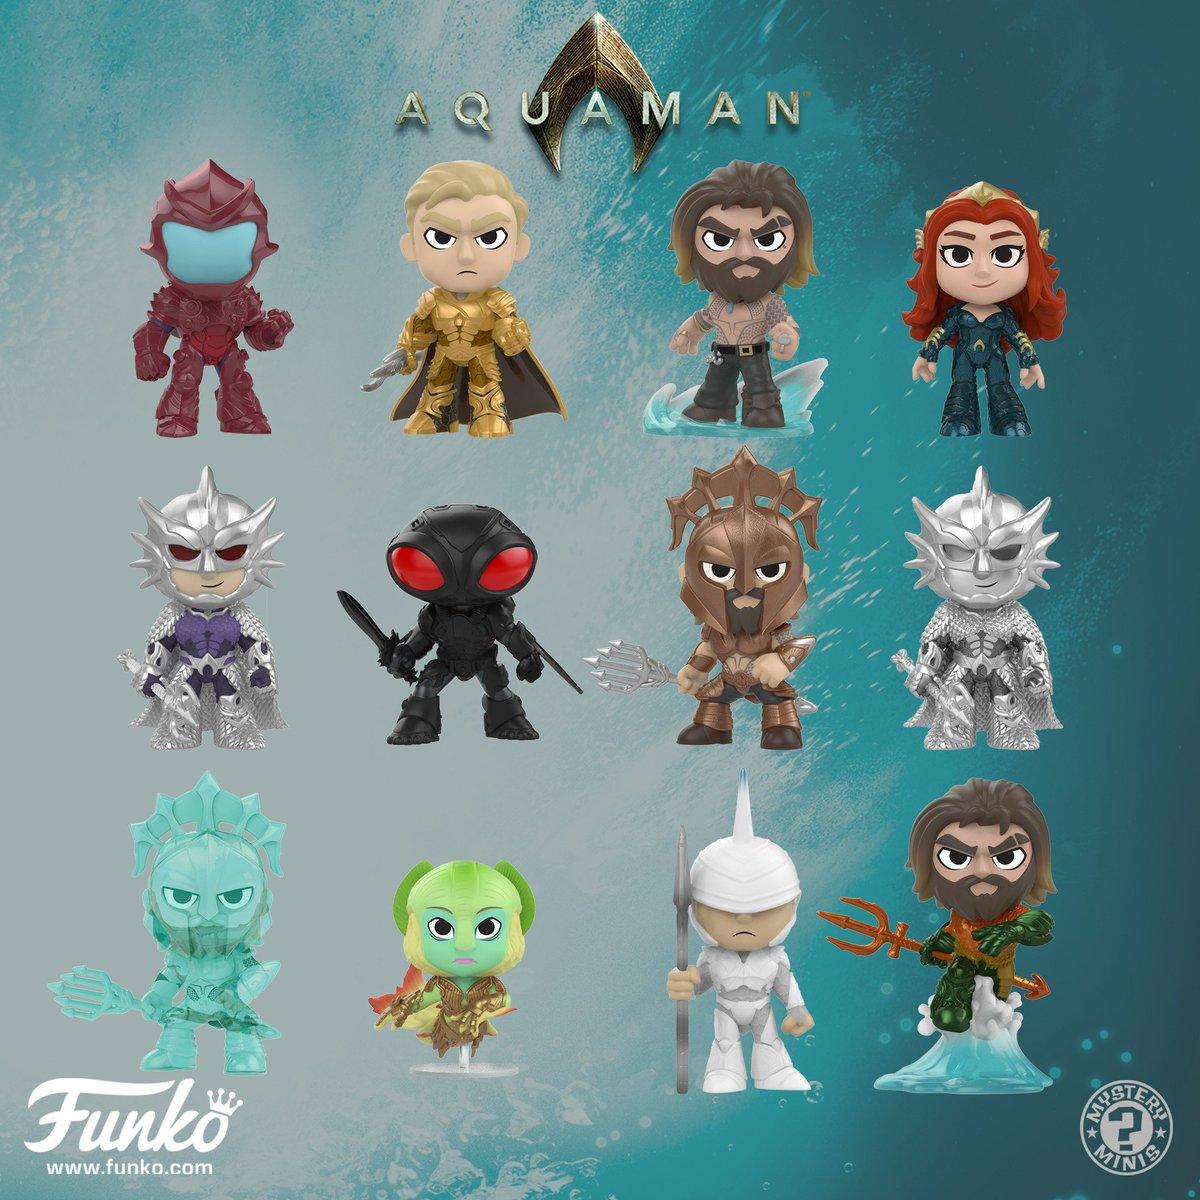 Coming Soon: Aquaman Mystery Minis, Pop! Keychains and Pop! #Aquaman funko.com/blog/article/8…